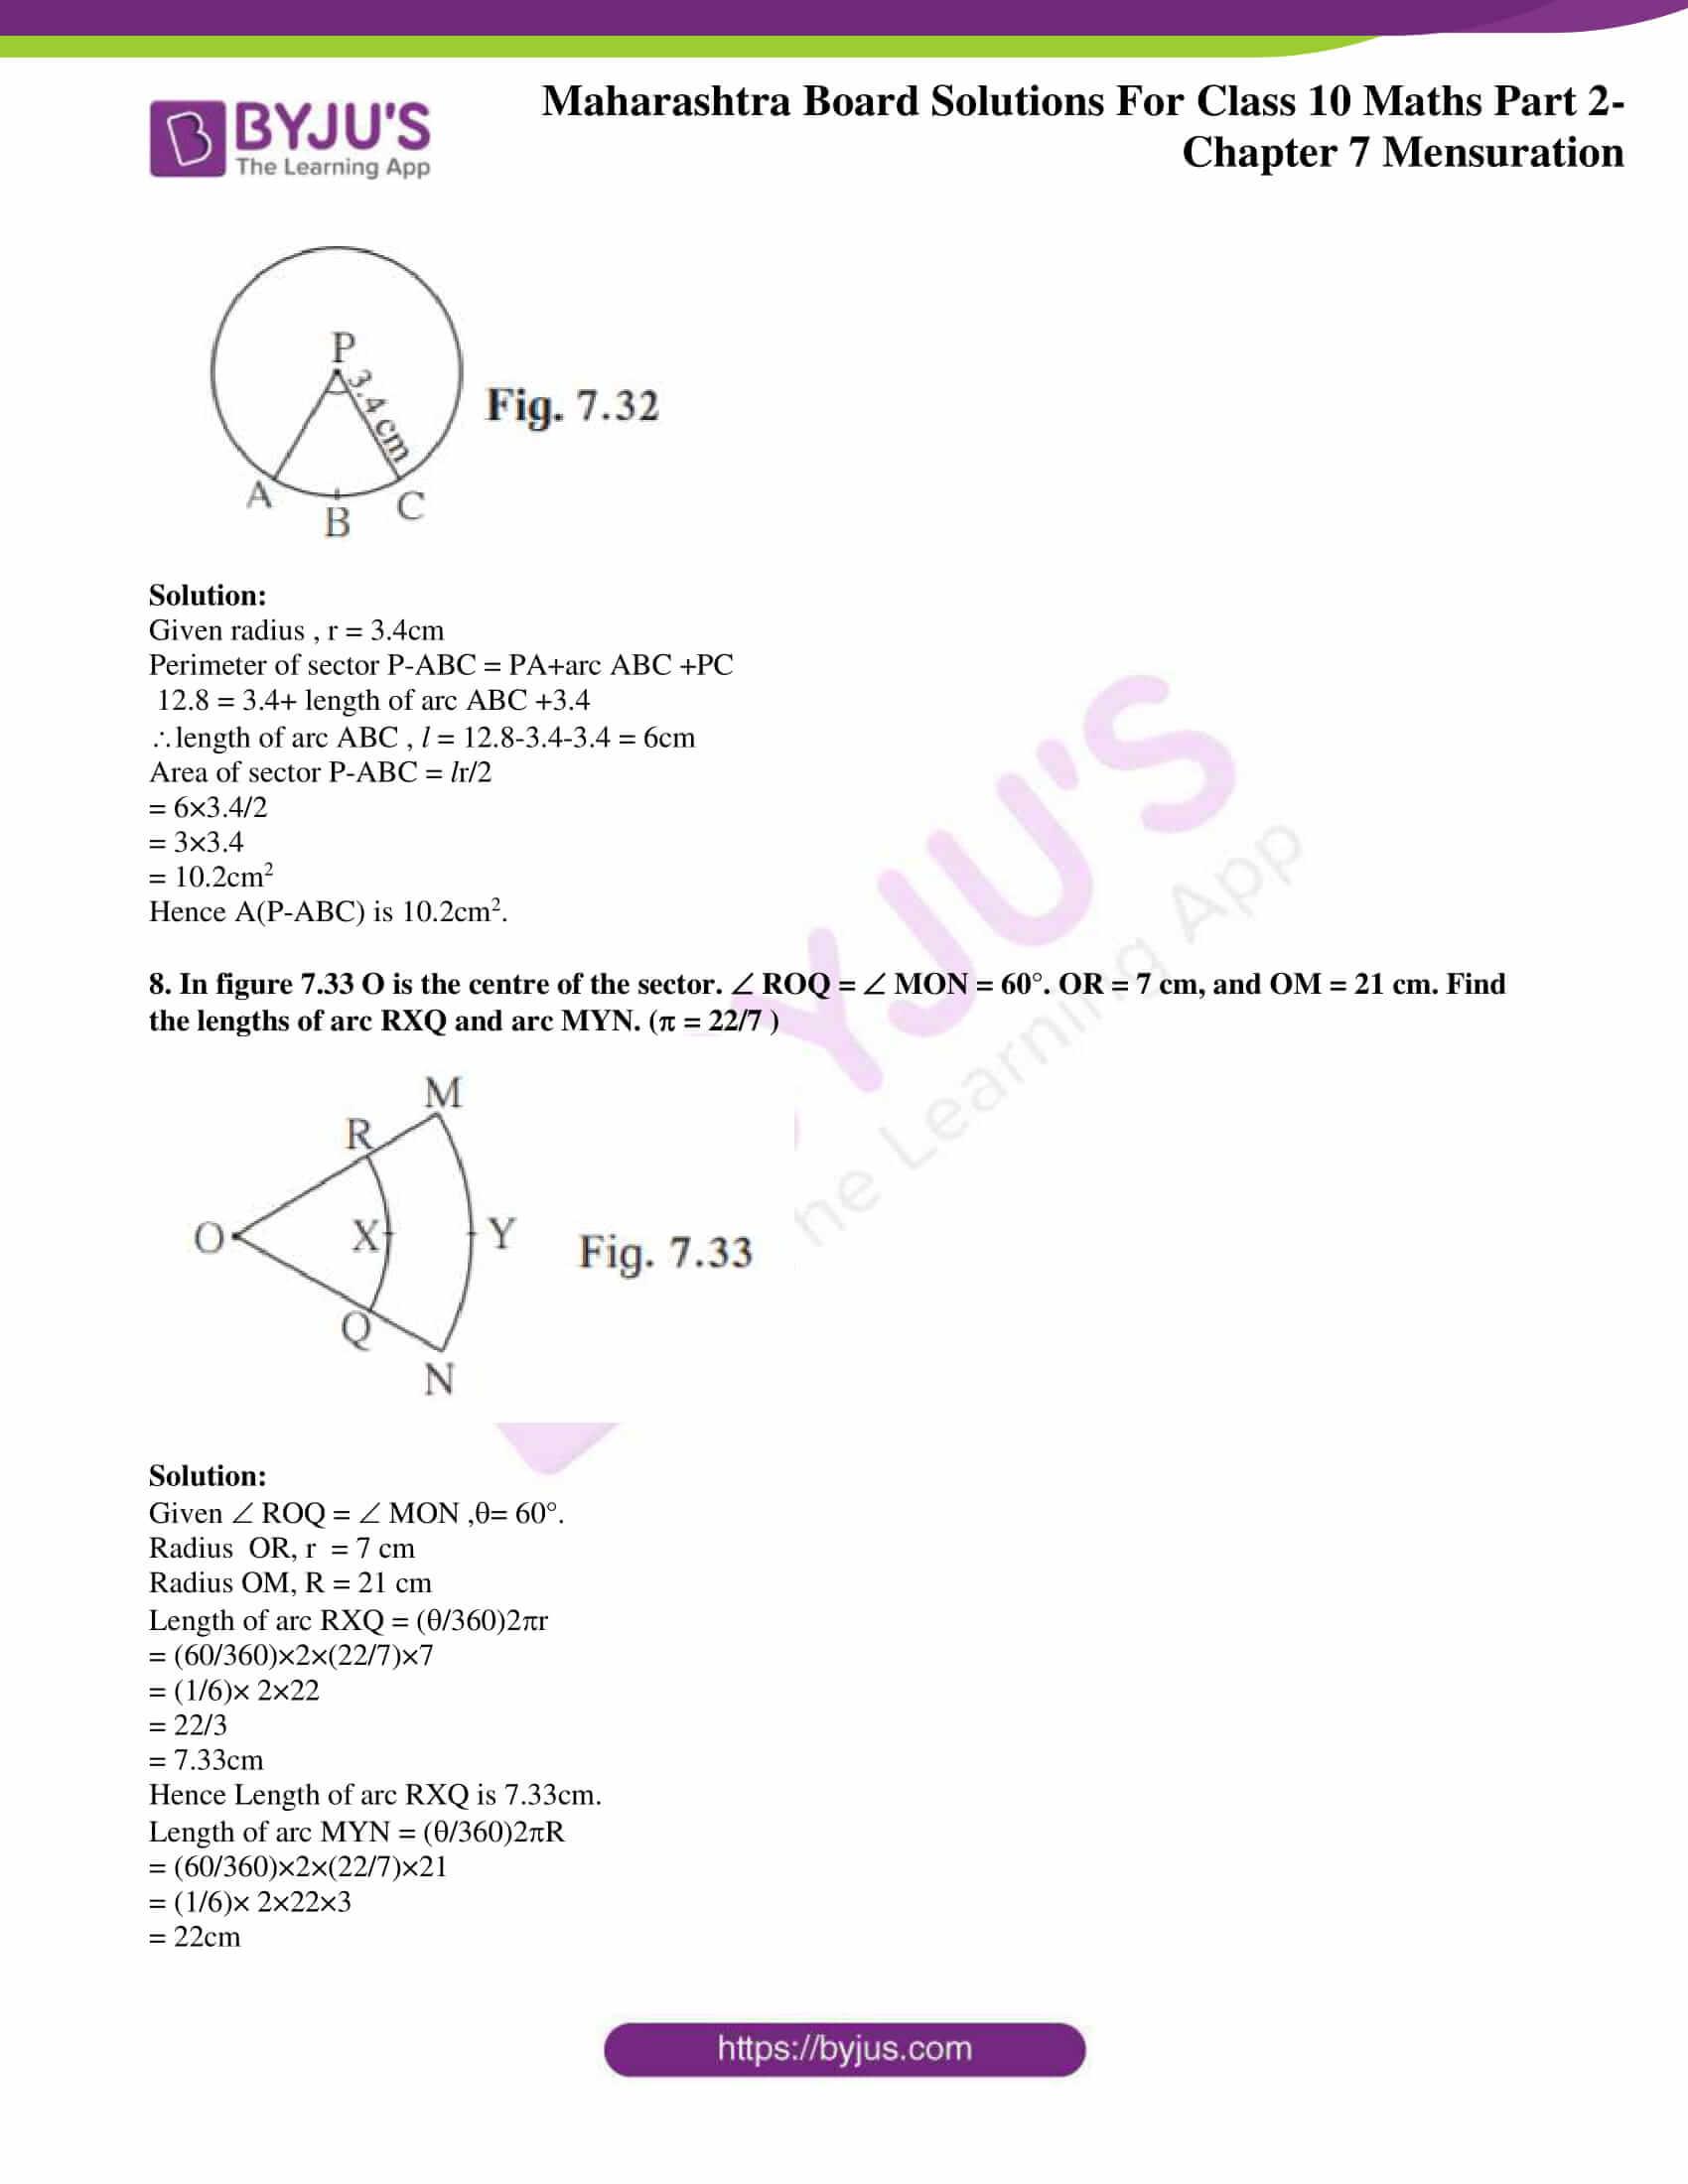 msbshse sol class 10 maths part 2 chapter 7 13